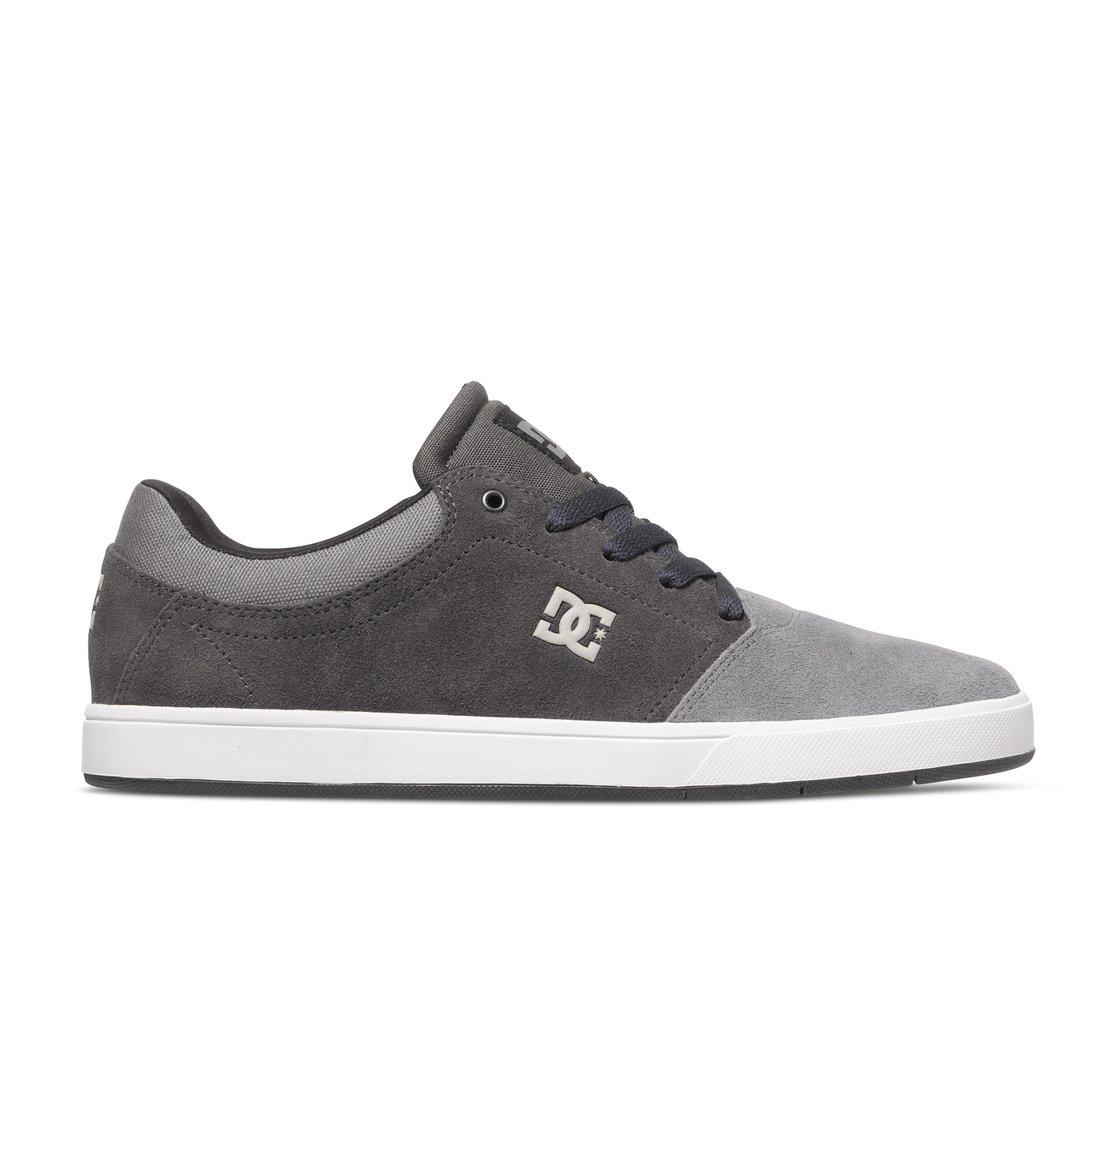 Buty Dc Crisis (Charcoal/Gray)